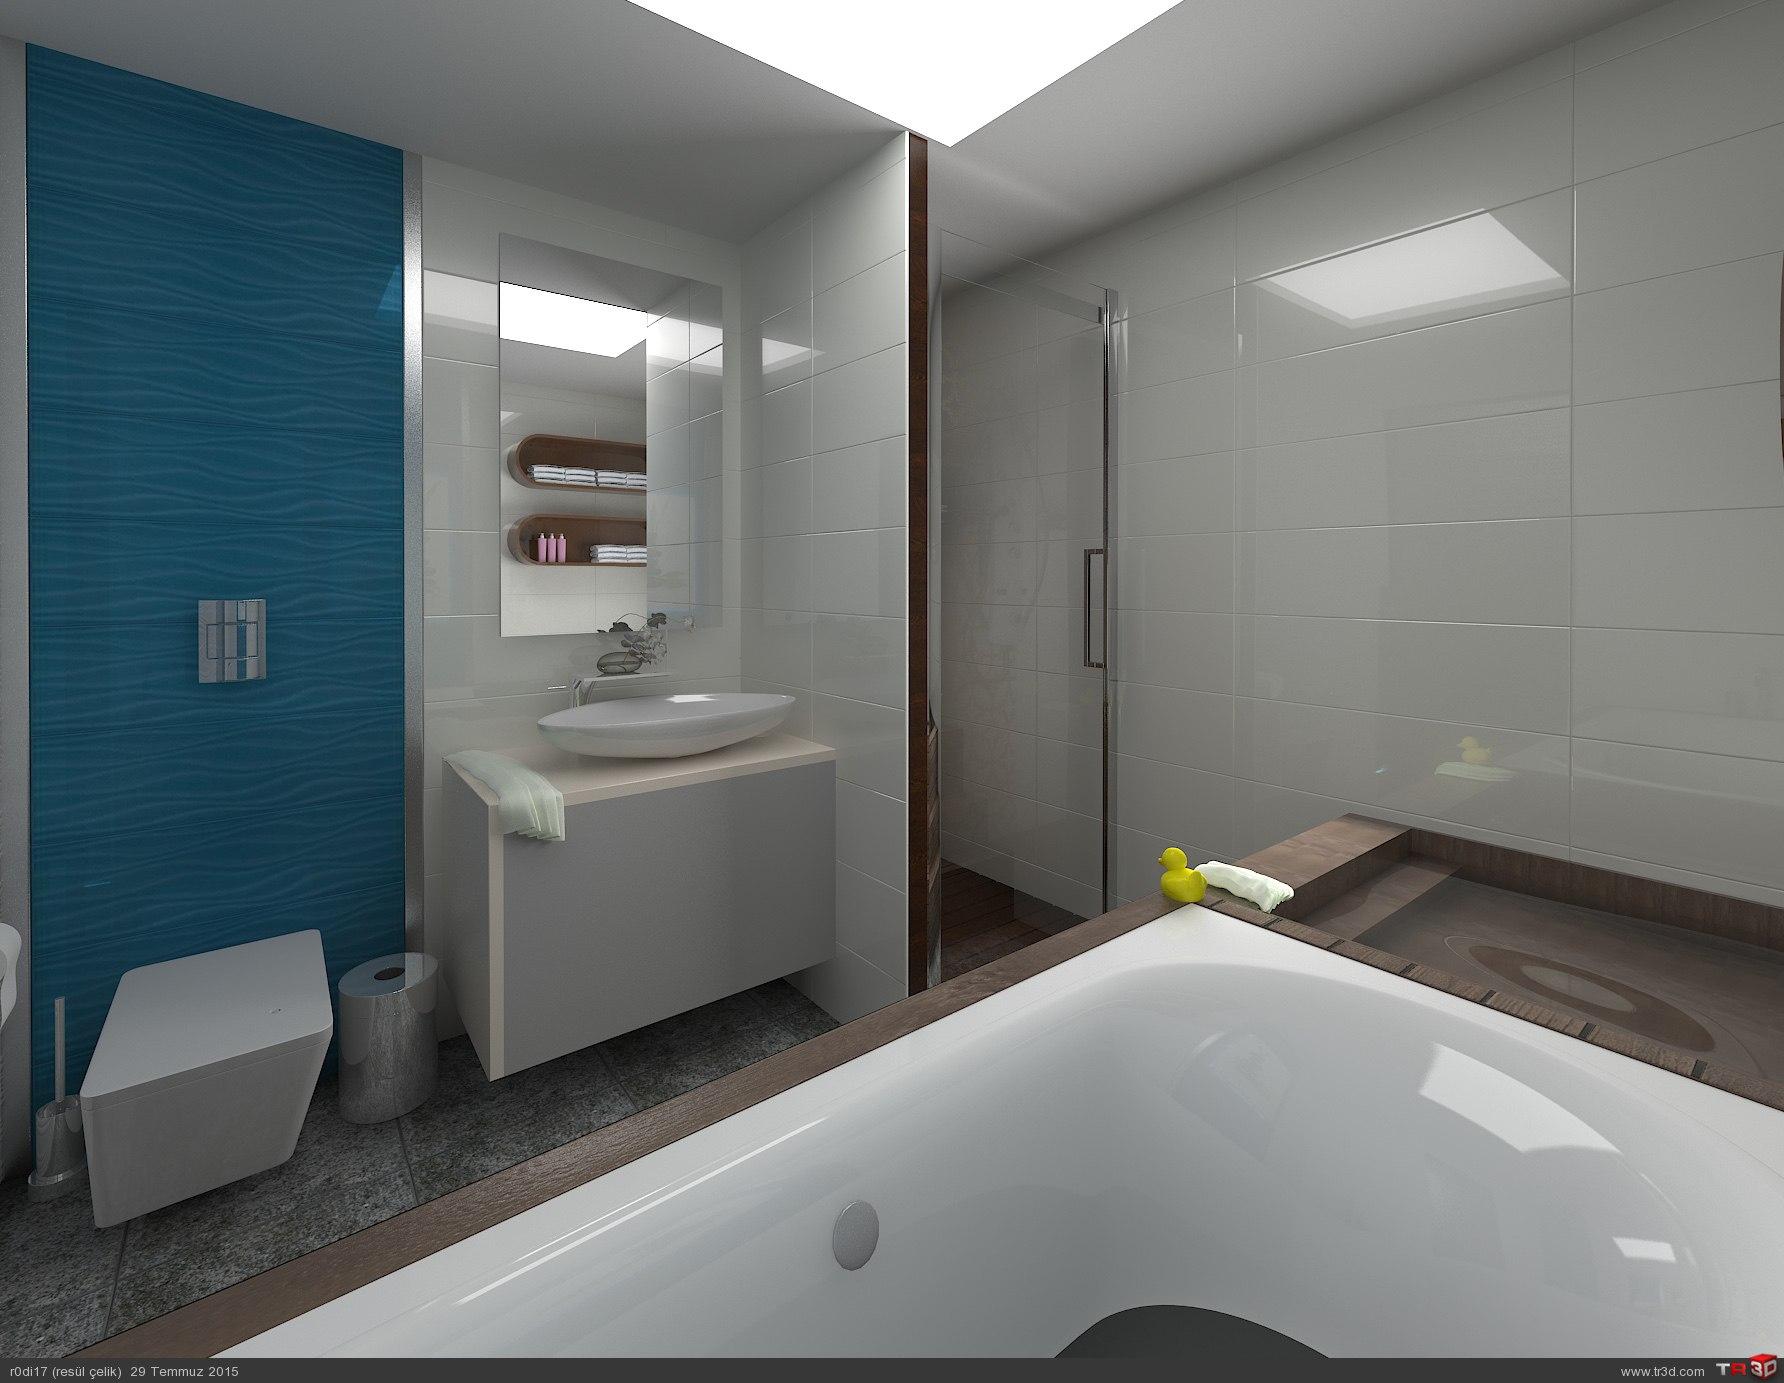 Banyo Çalışması. 1